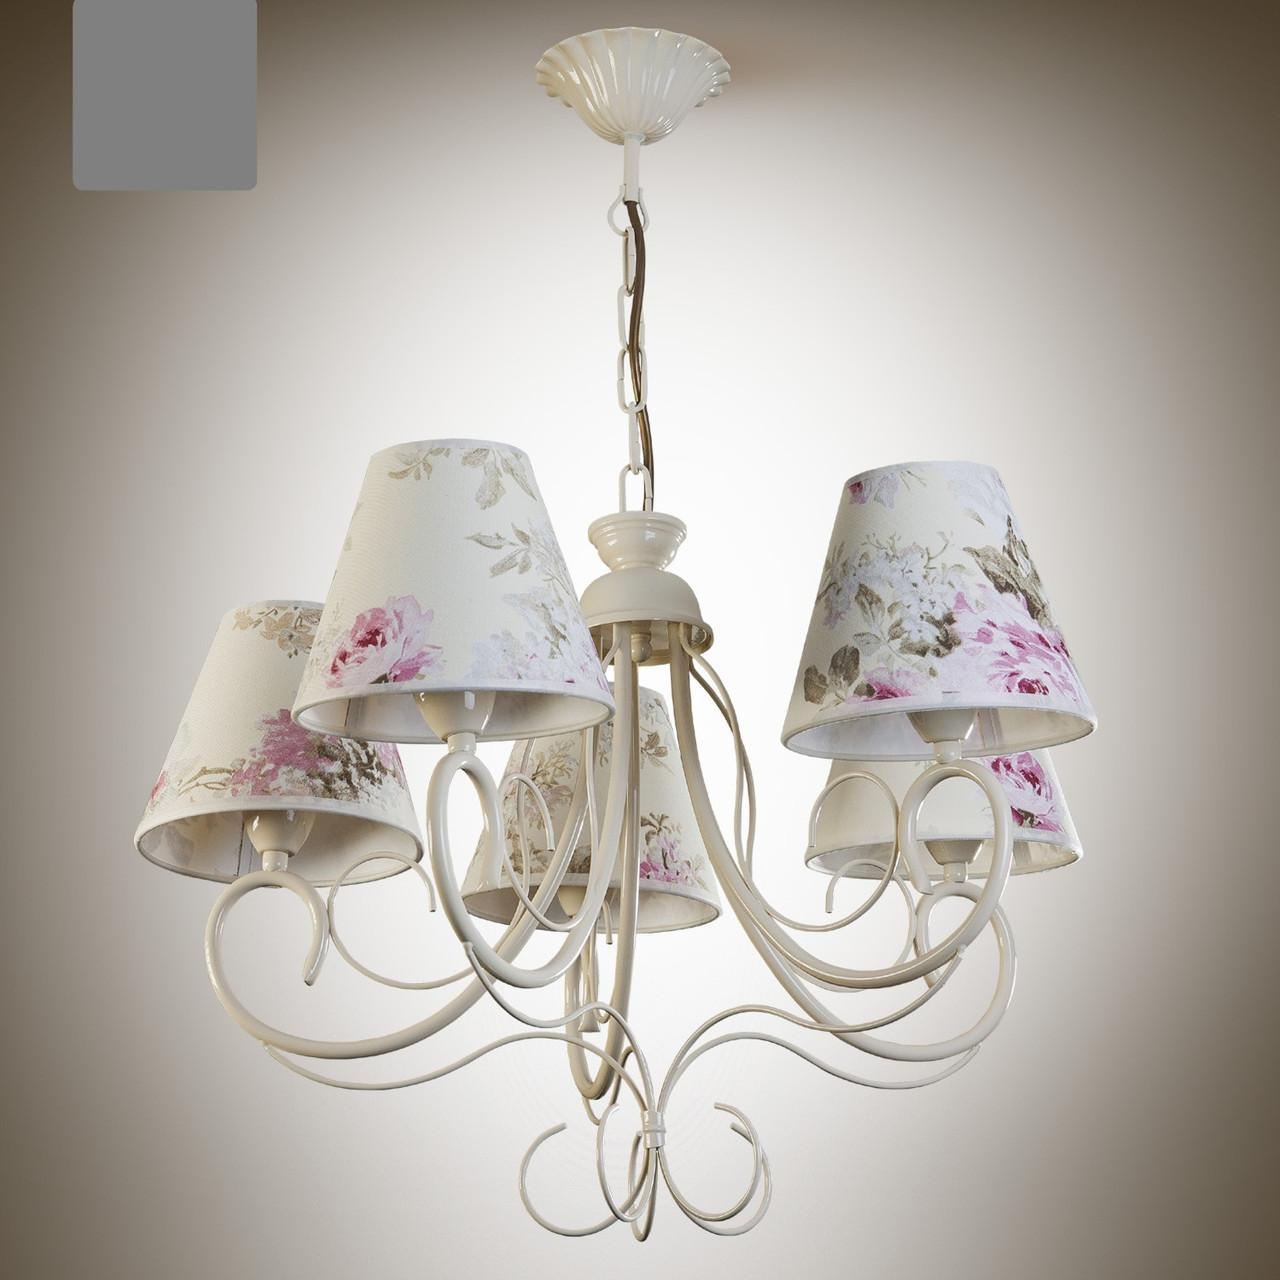 Люстра прованс для спальни, зала, 5-ти ламповая с абажурами  6205-3